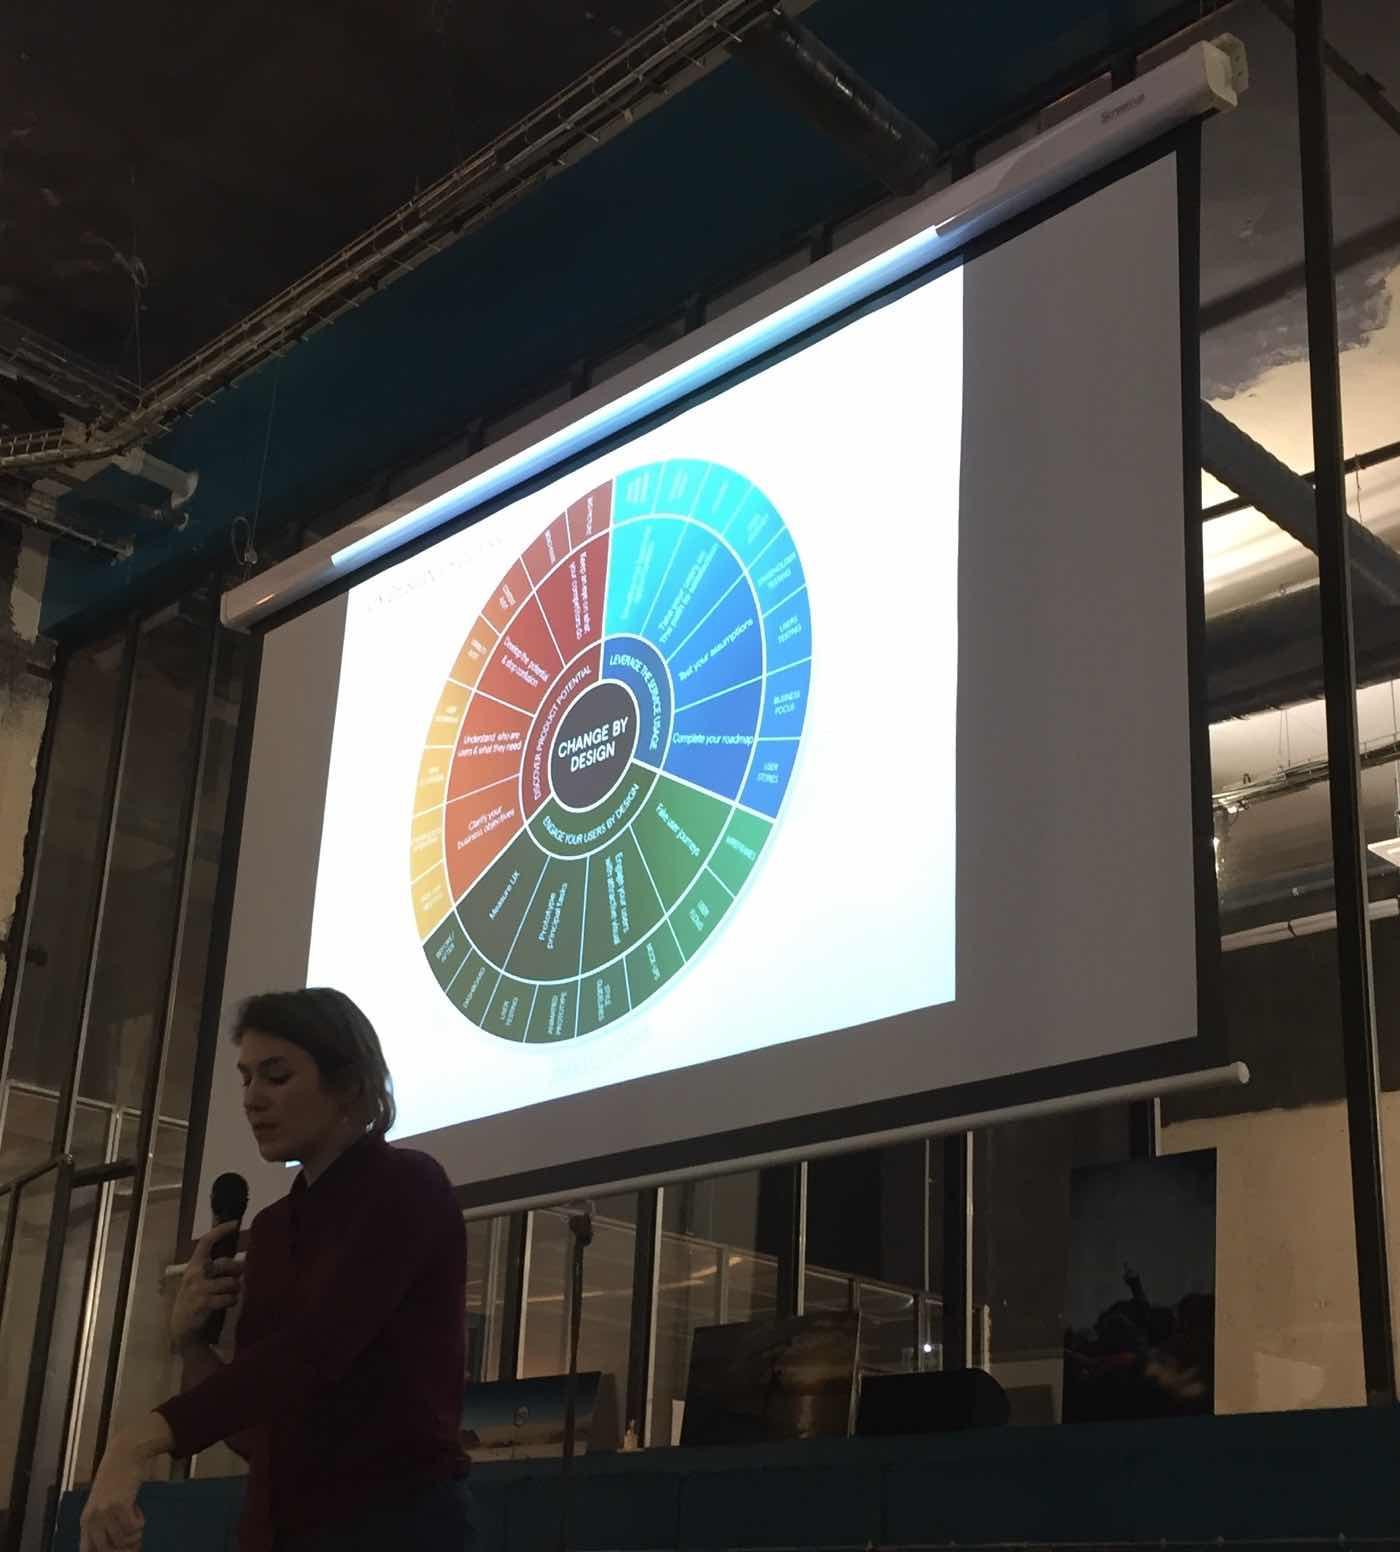 Remix-coworking-paris-workshop-ux-design1.jpg